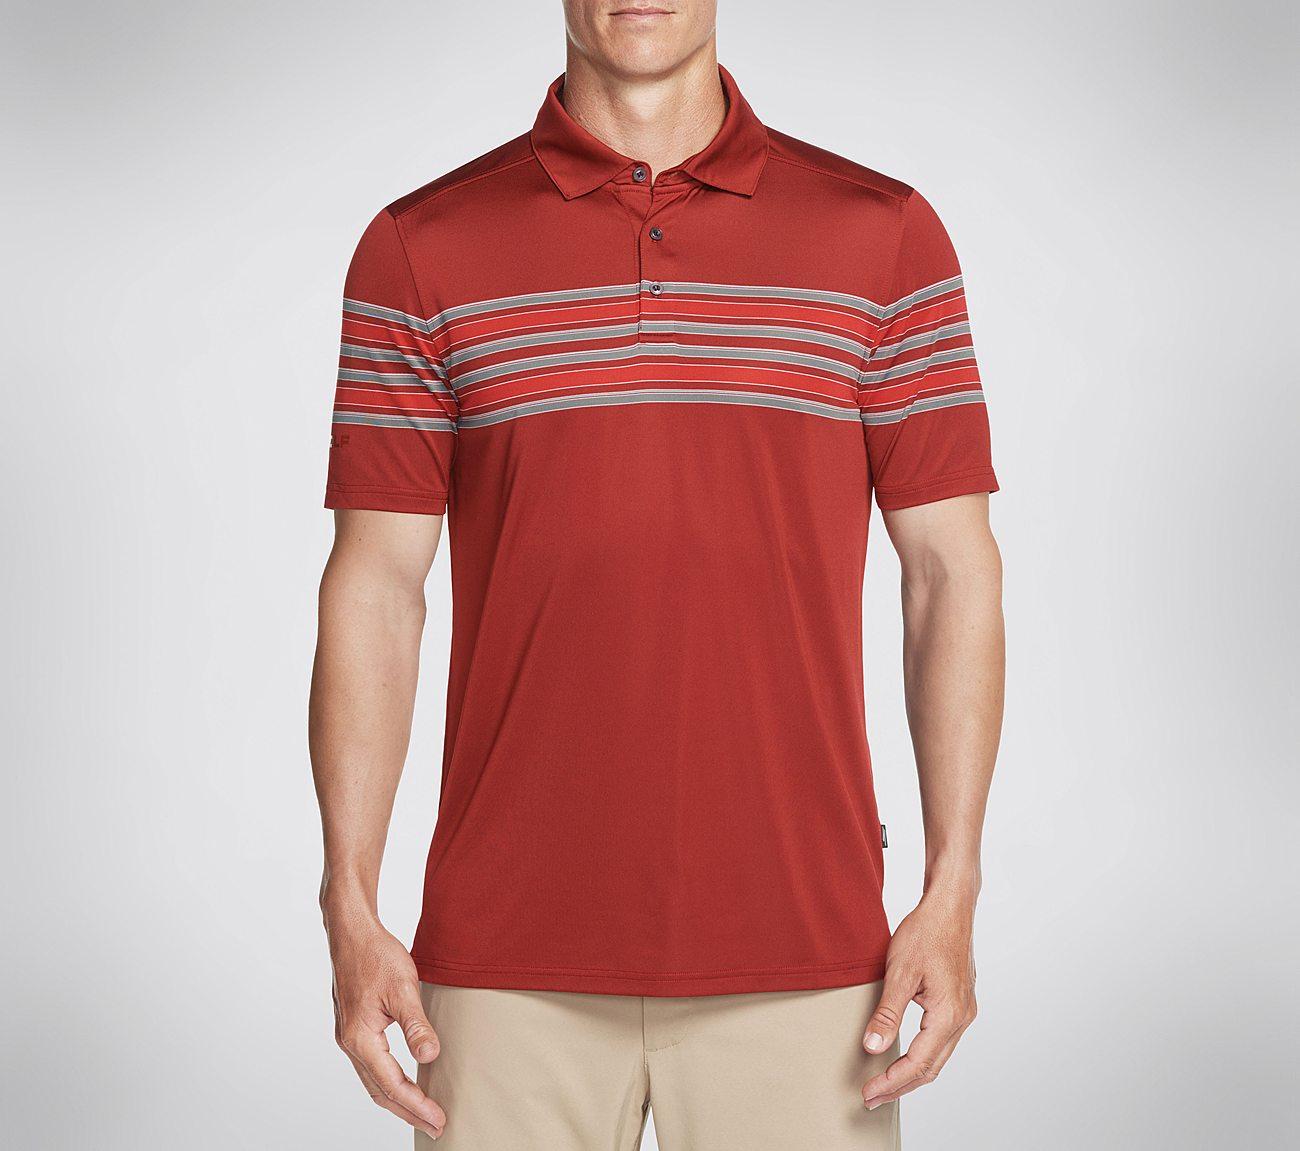 Skechers GOGOLF Club Face Stripe Polo Shirt